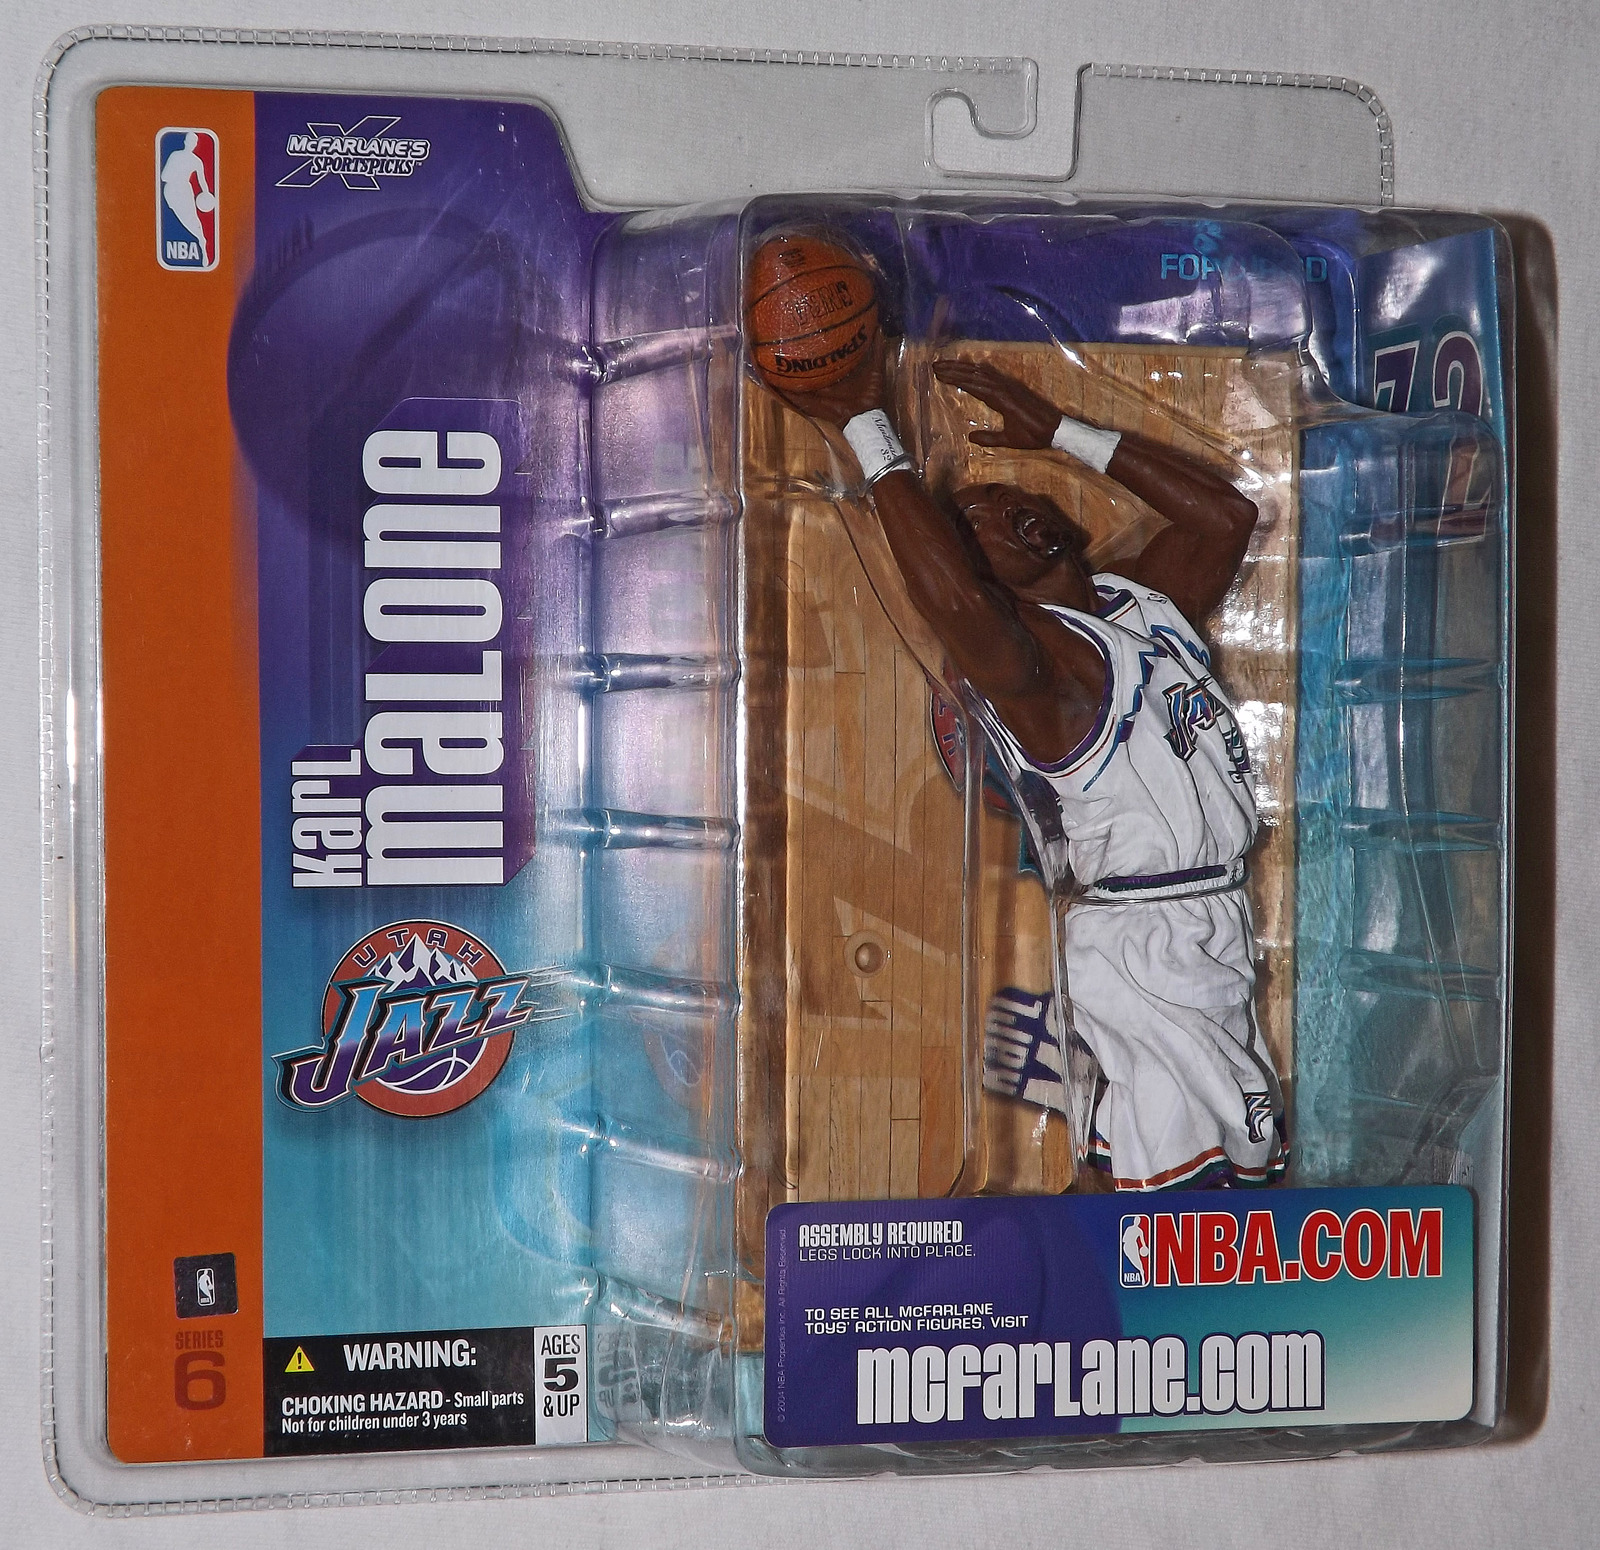 2004 Karl Malone Utah Jazz Uniform retro/Chase 6' Action Figure NBA Series 6